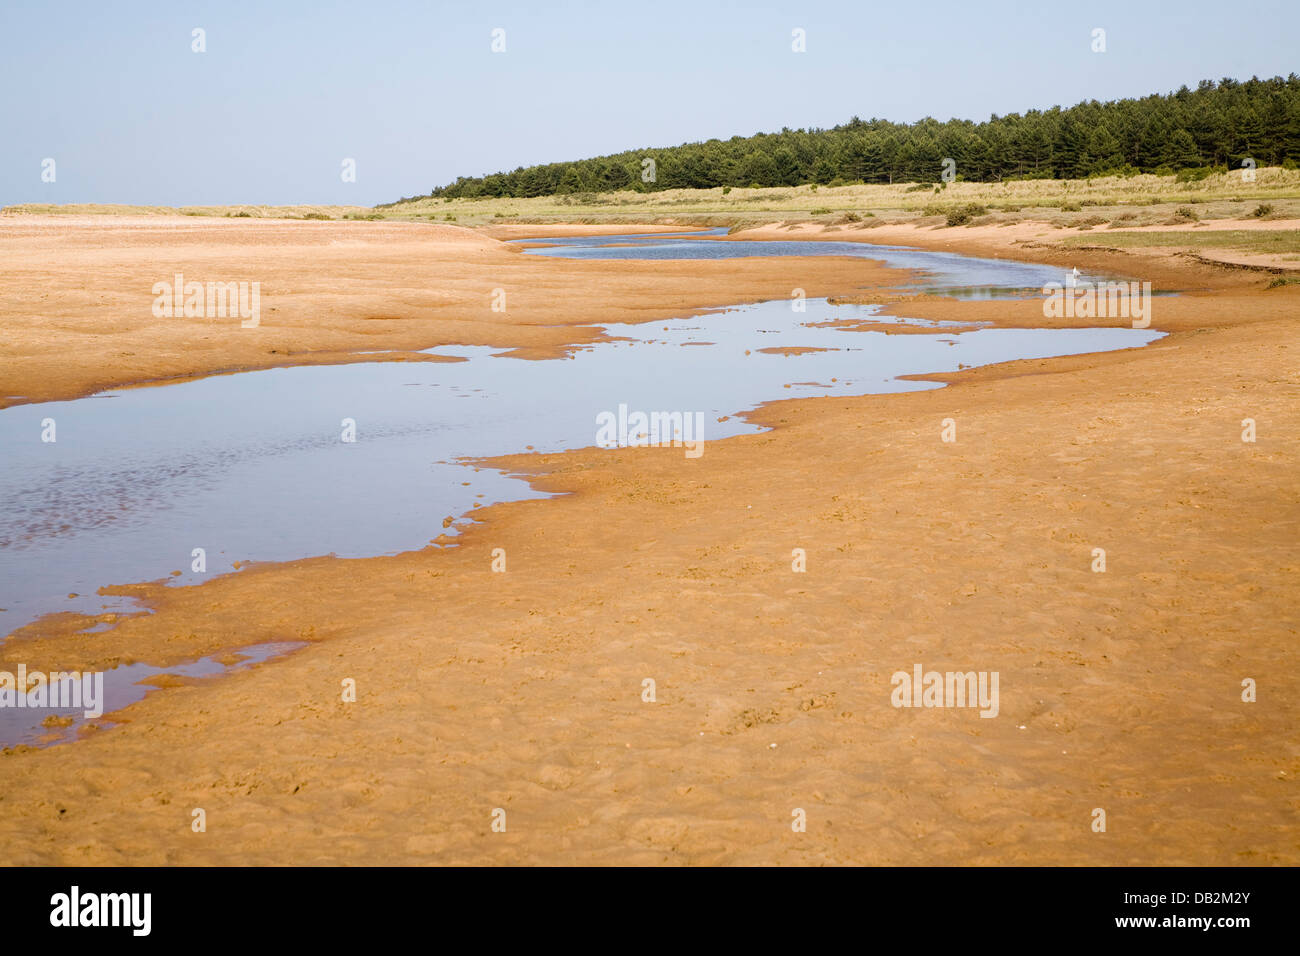 Stream running across wide sandy beach Holkham Norfolk England - Stock Image